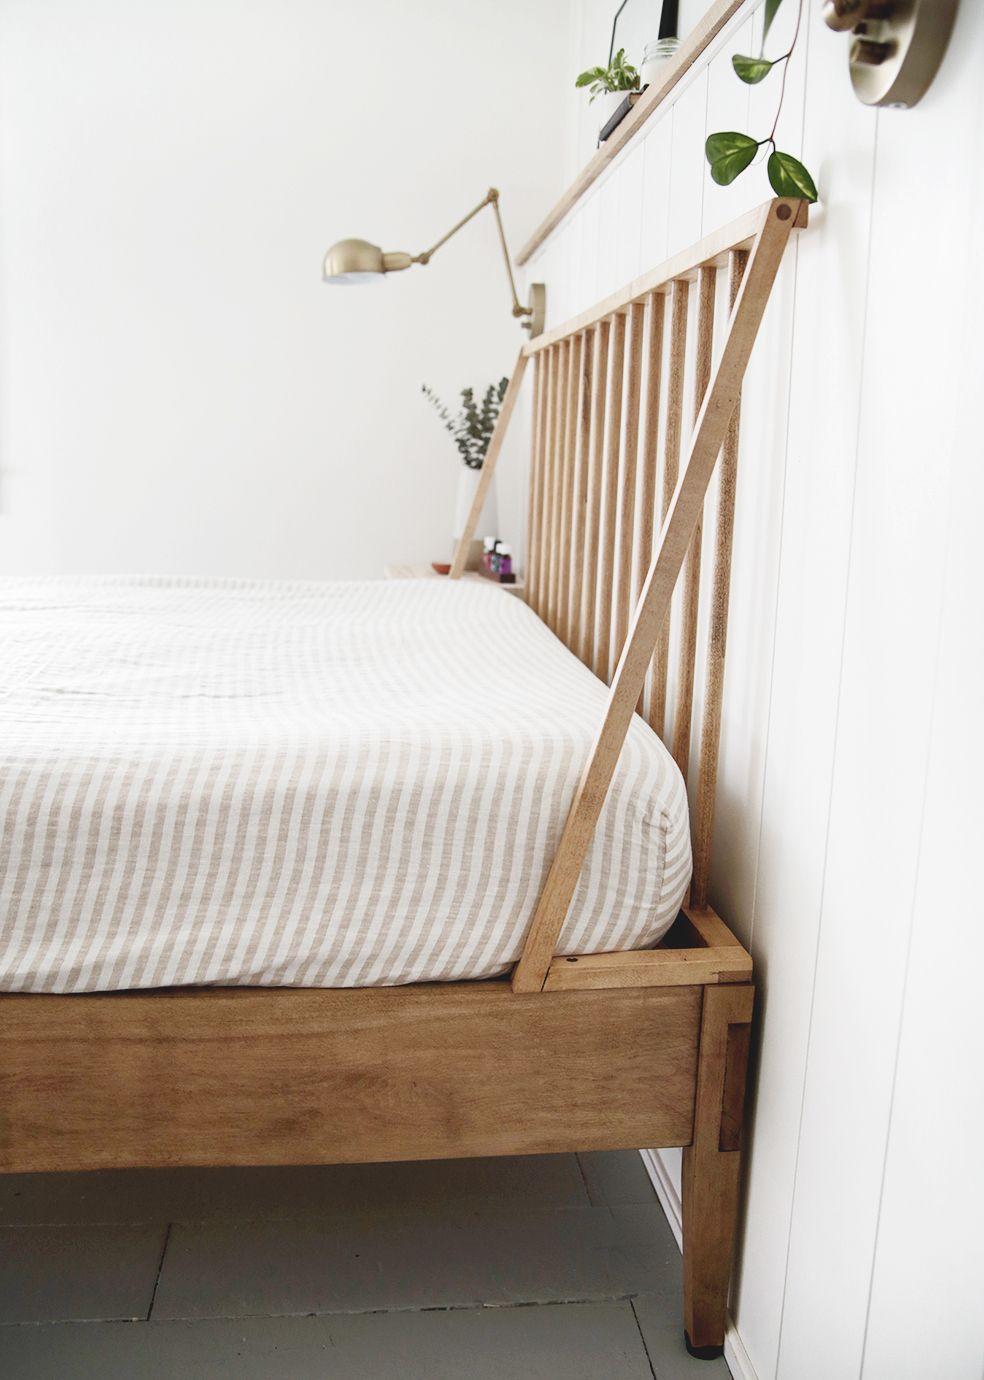 DIY Dowel Headboard in 2020 Diy bed headboard, Bed